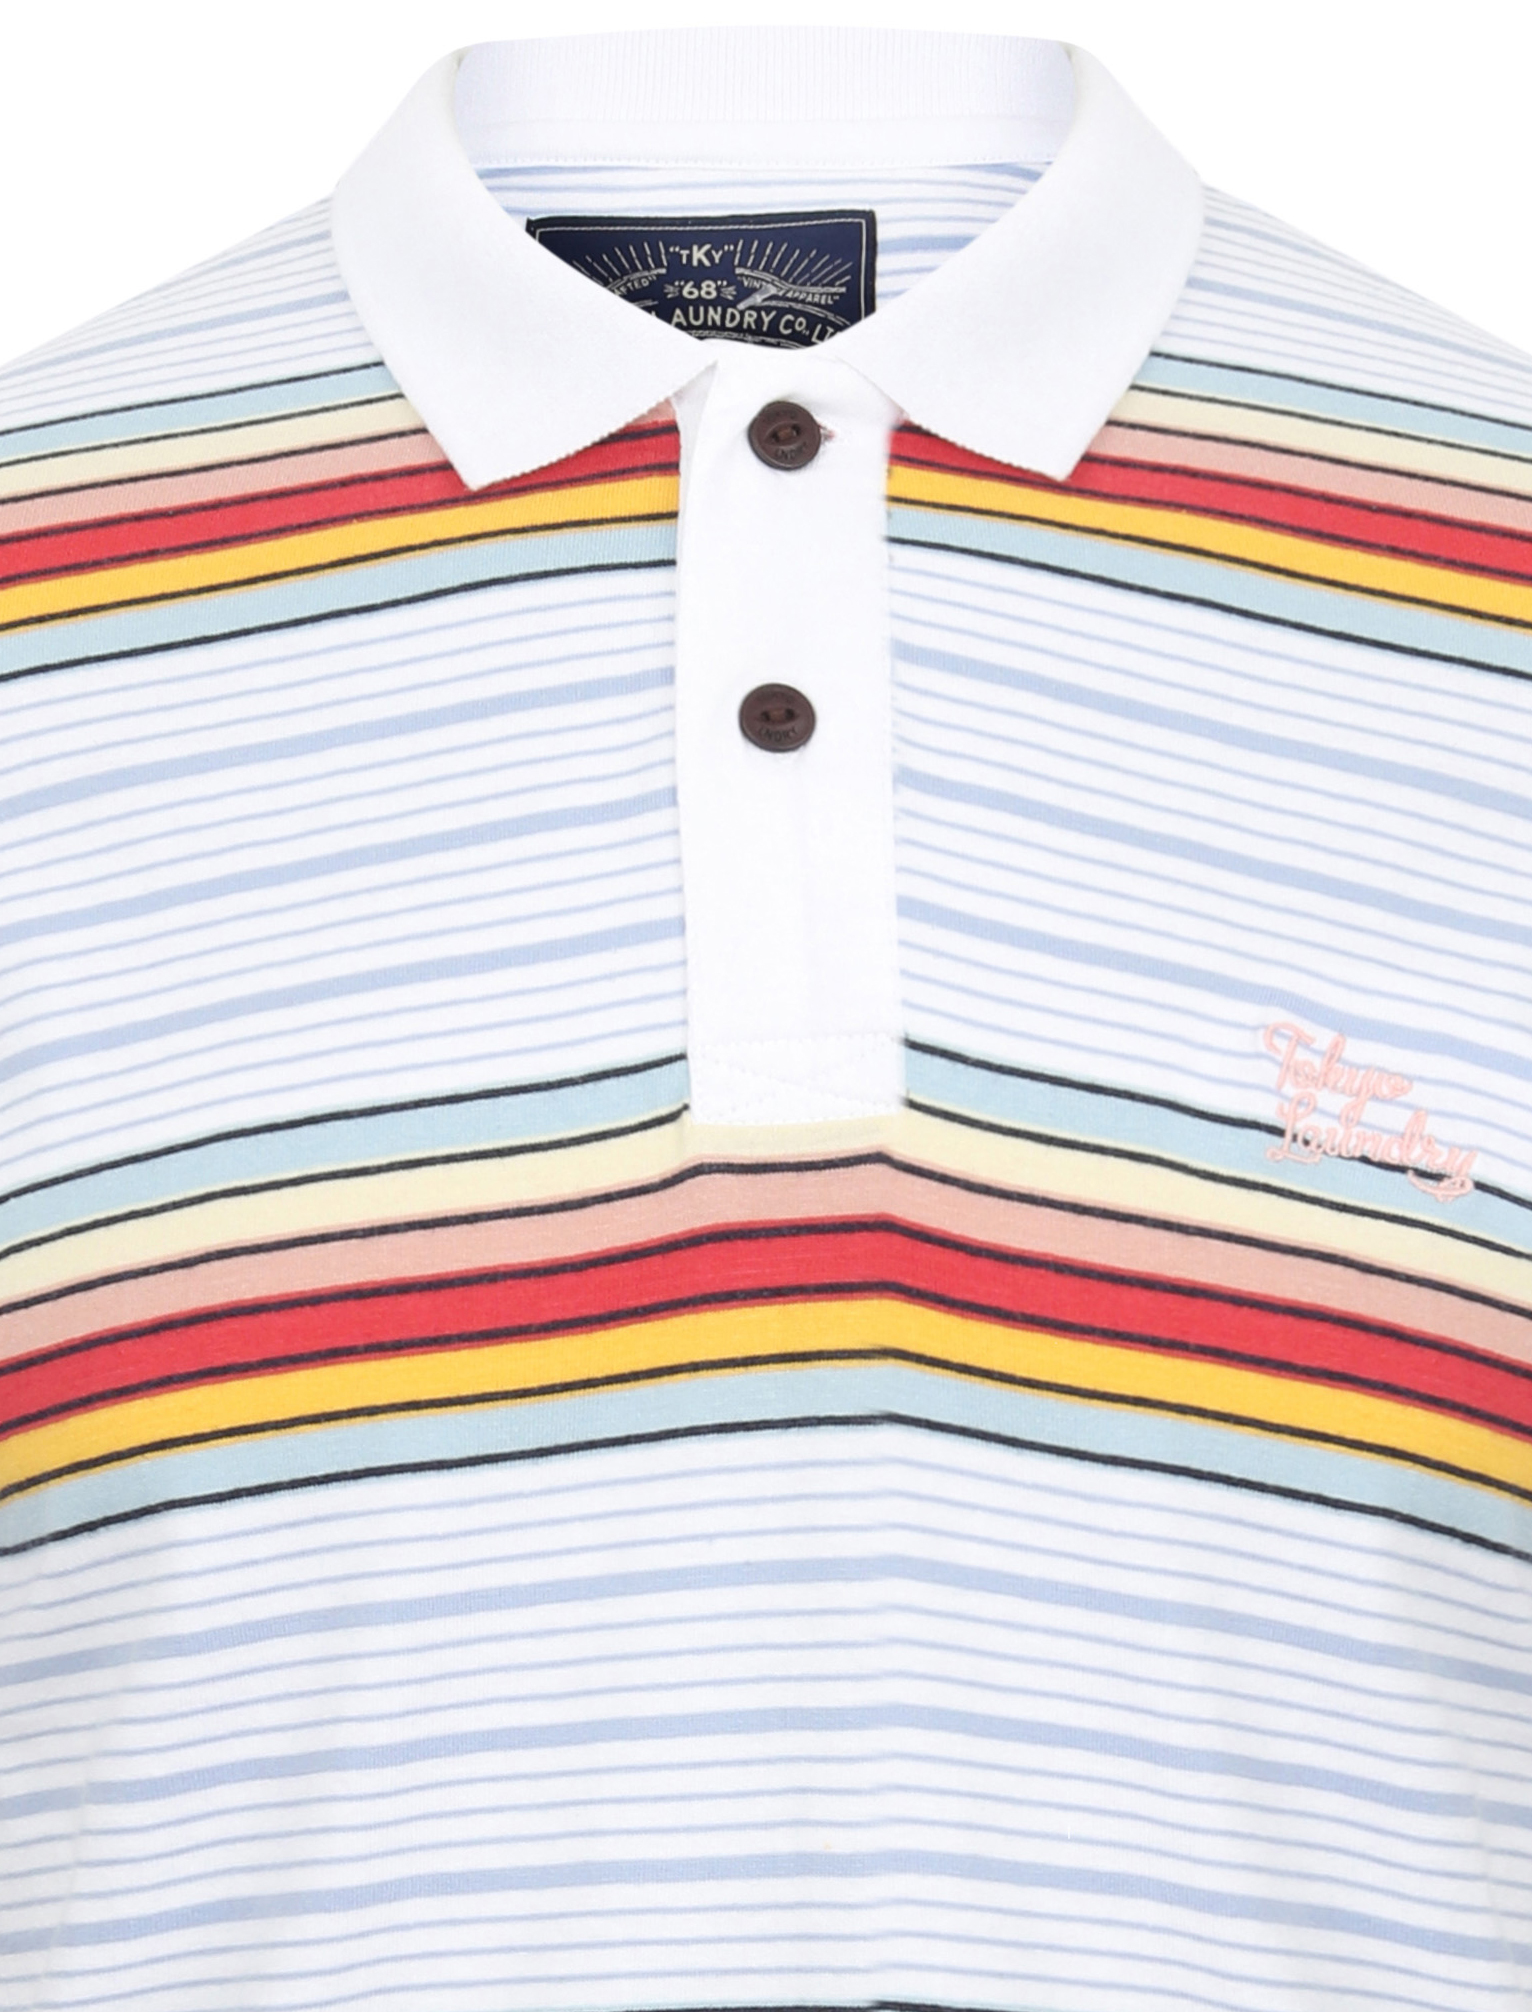 Tokyo-Laundry-Men-039-s-Bakersfield-Striped-Polo-Shirt-Stripy-Retro-Vintage-T-Shirt thumbnail 11